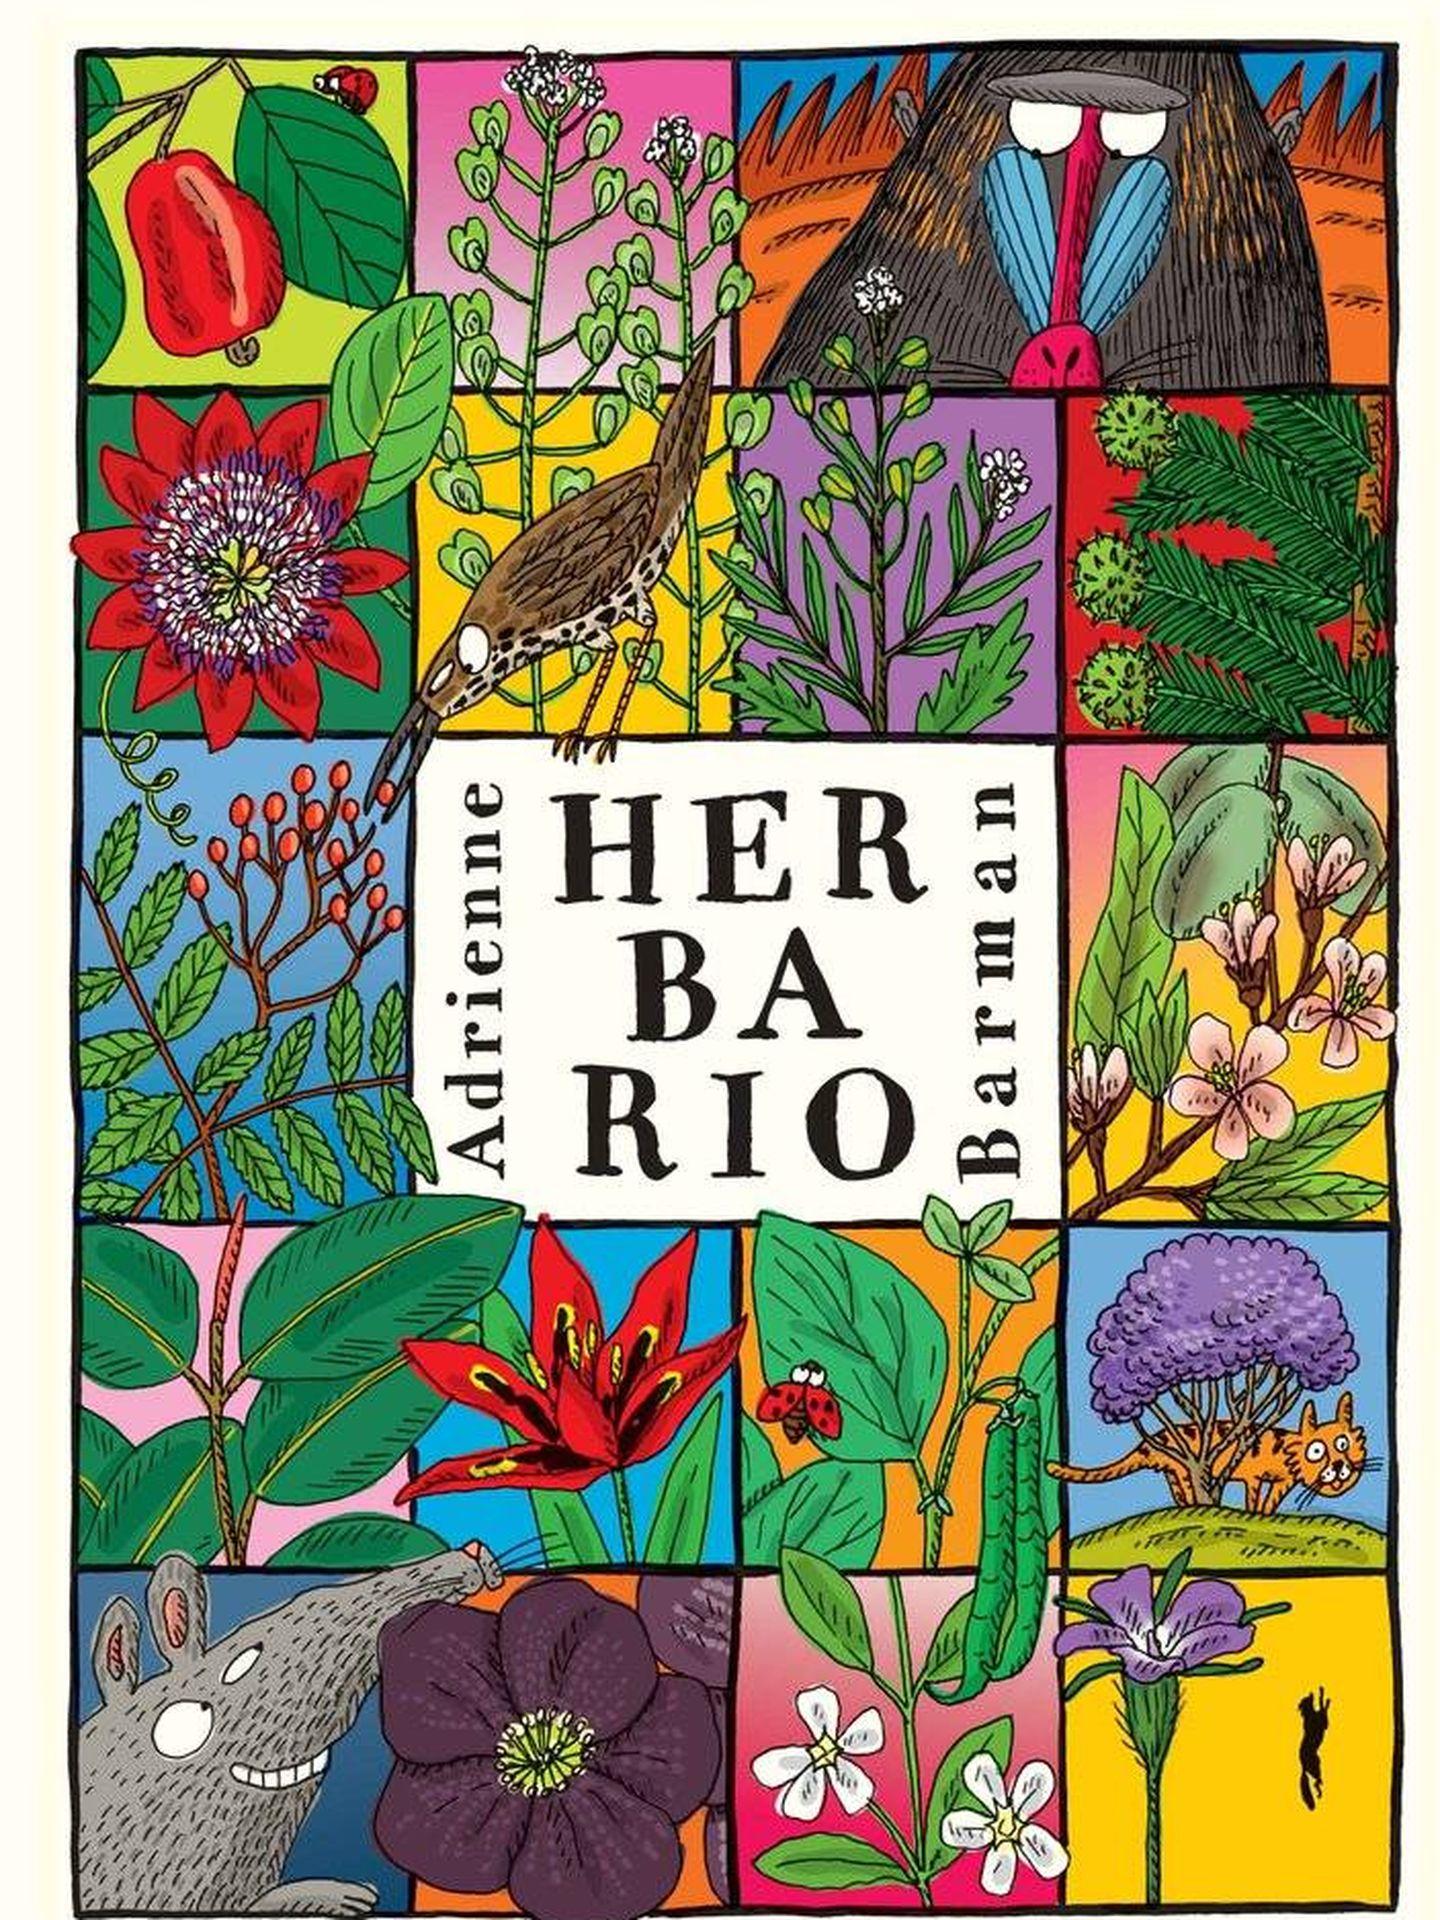 'Herbario'. (Zorro Rojo)